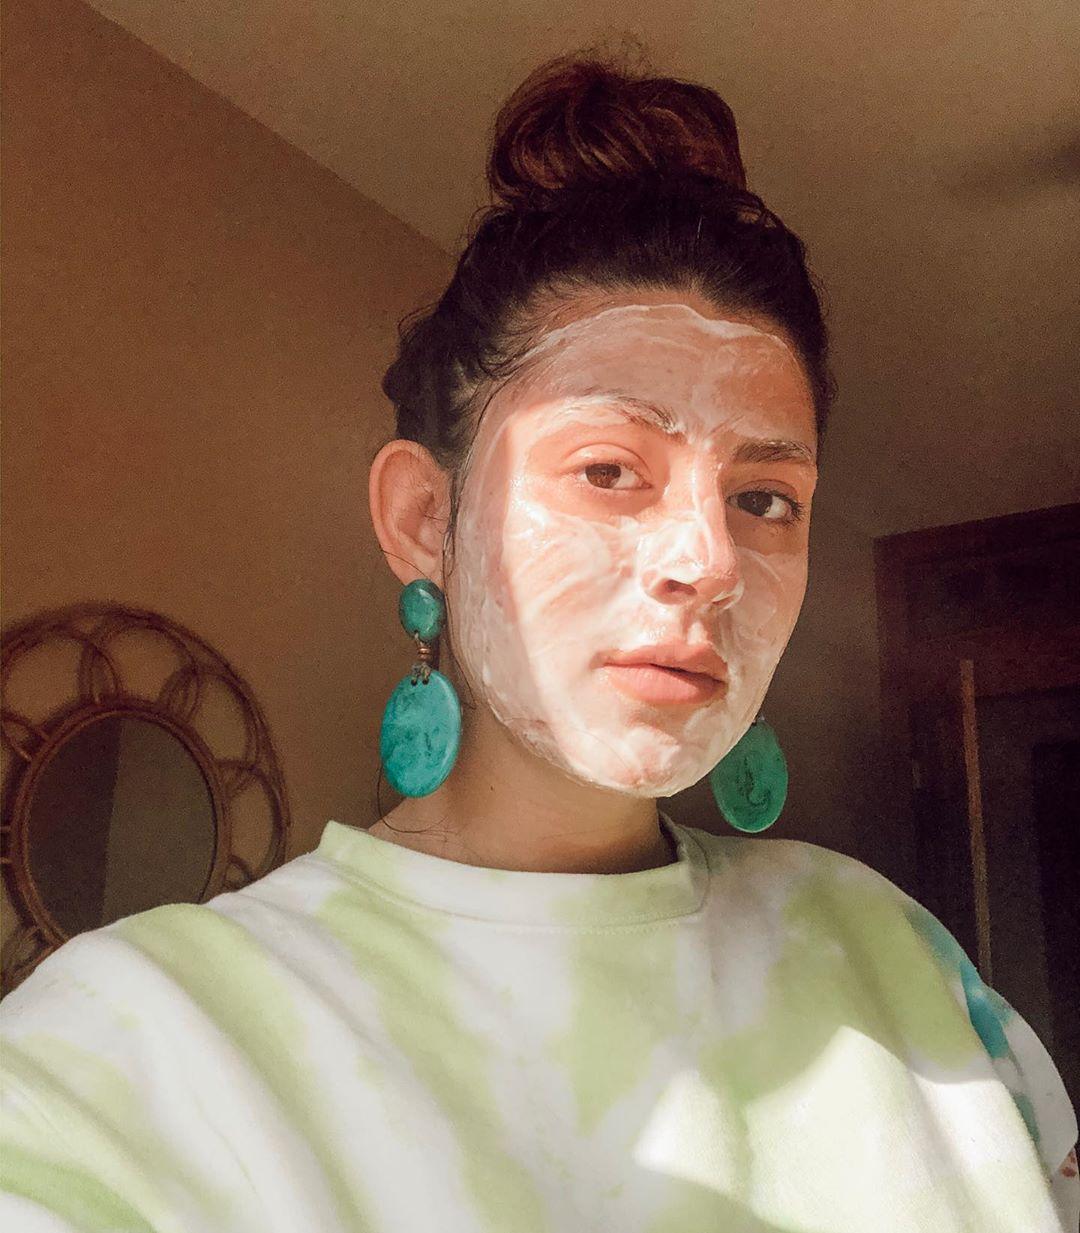 food-yogurt-face-mask.jpg